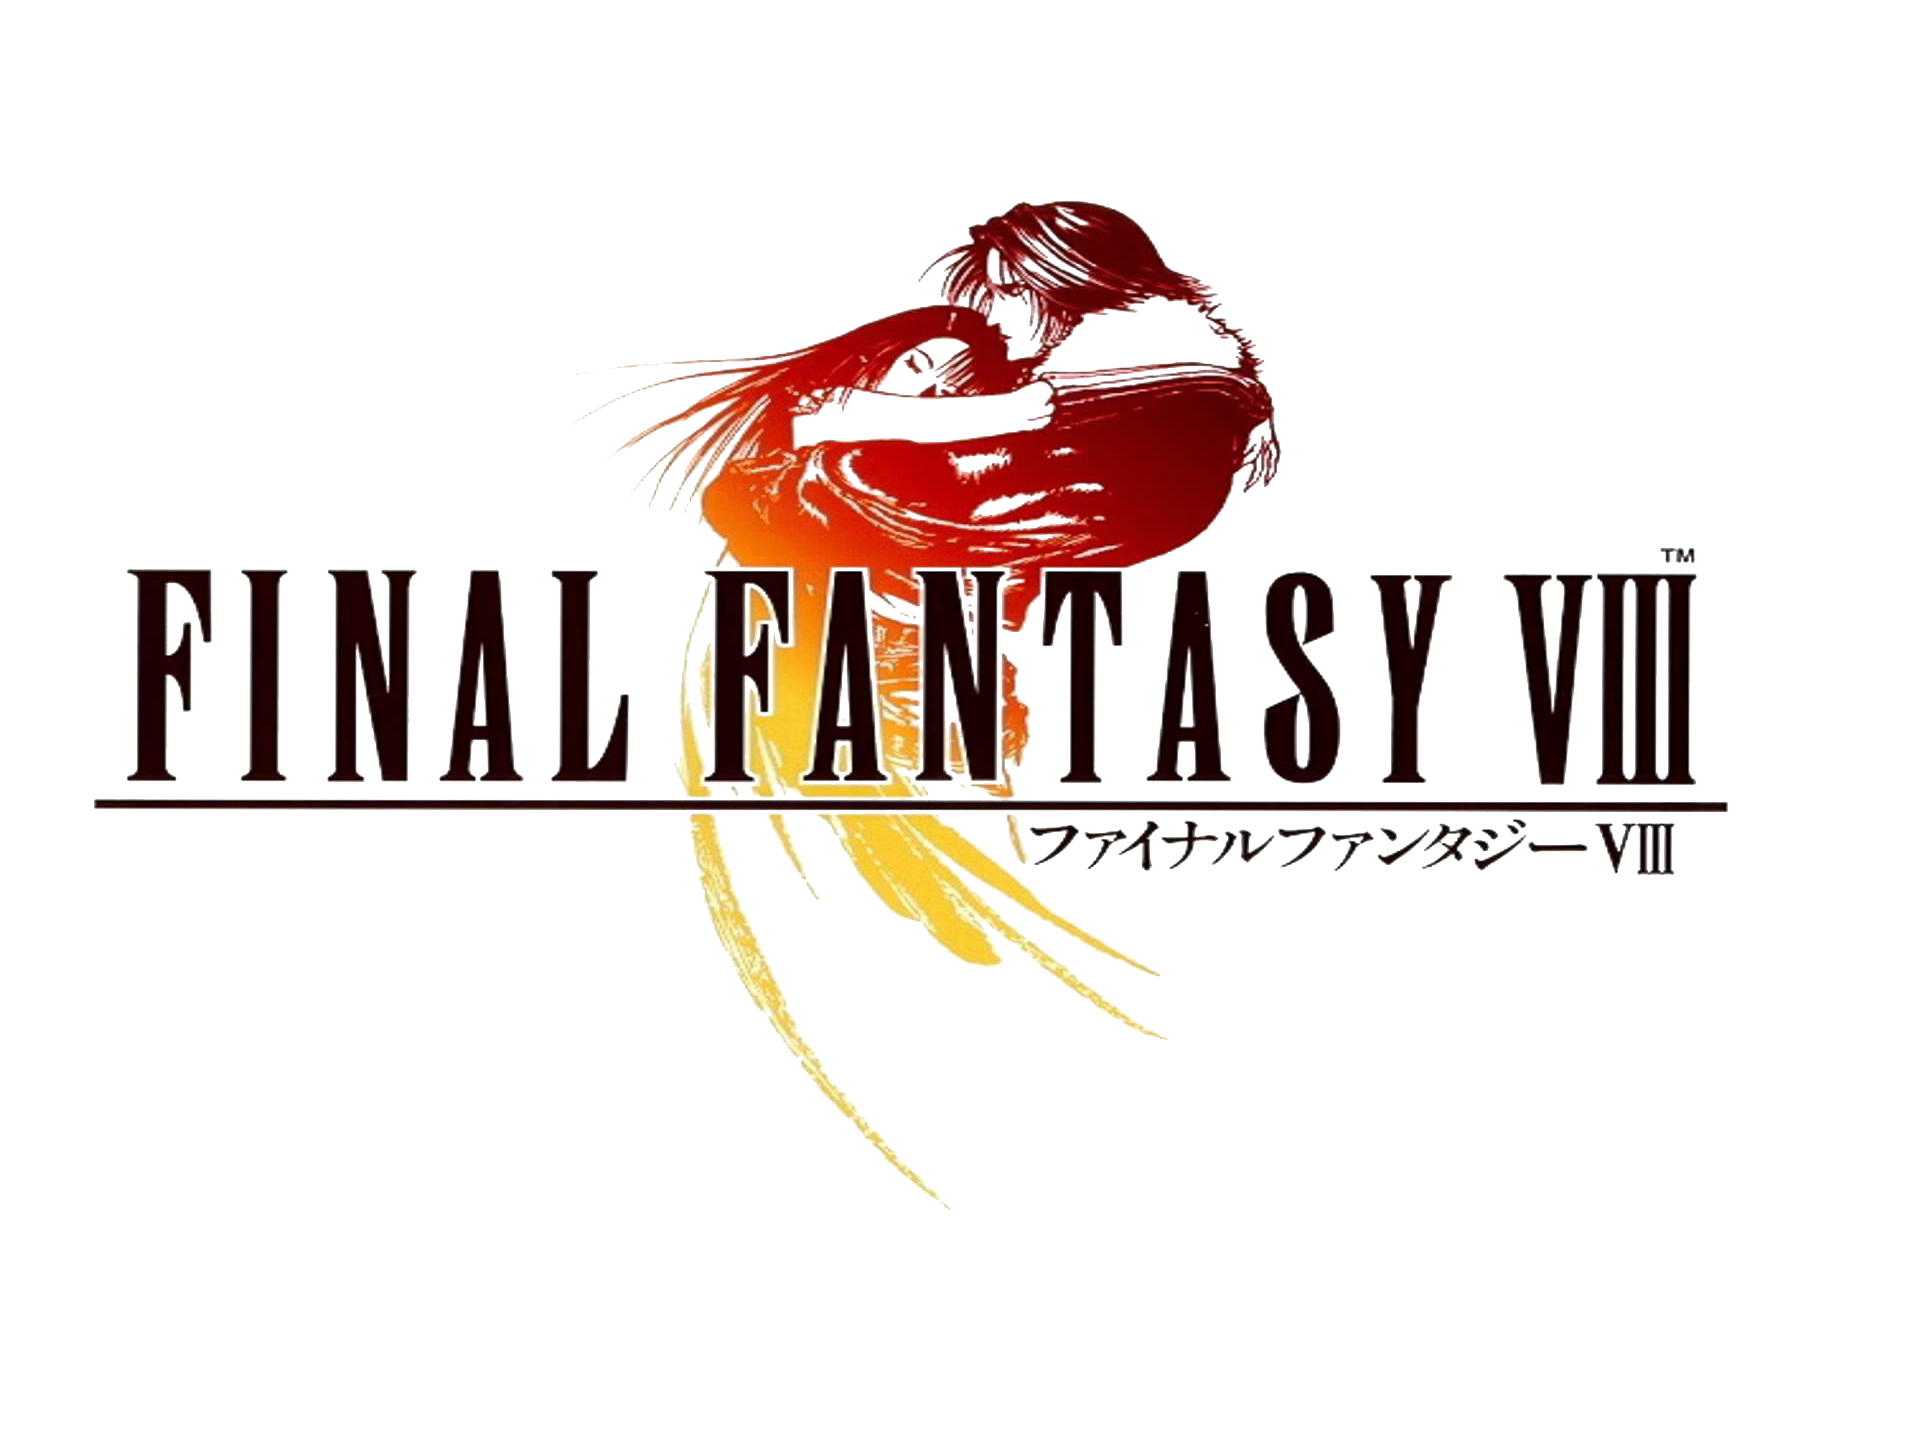 Final fantasy viii windows ps3 ps1 vita psp game mod db for Final fantasy 8 architecture